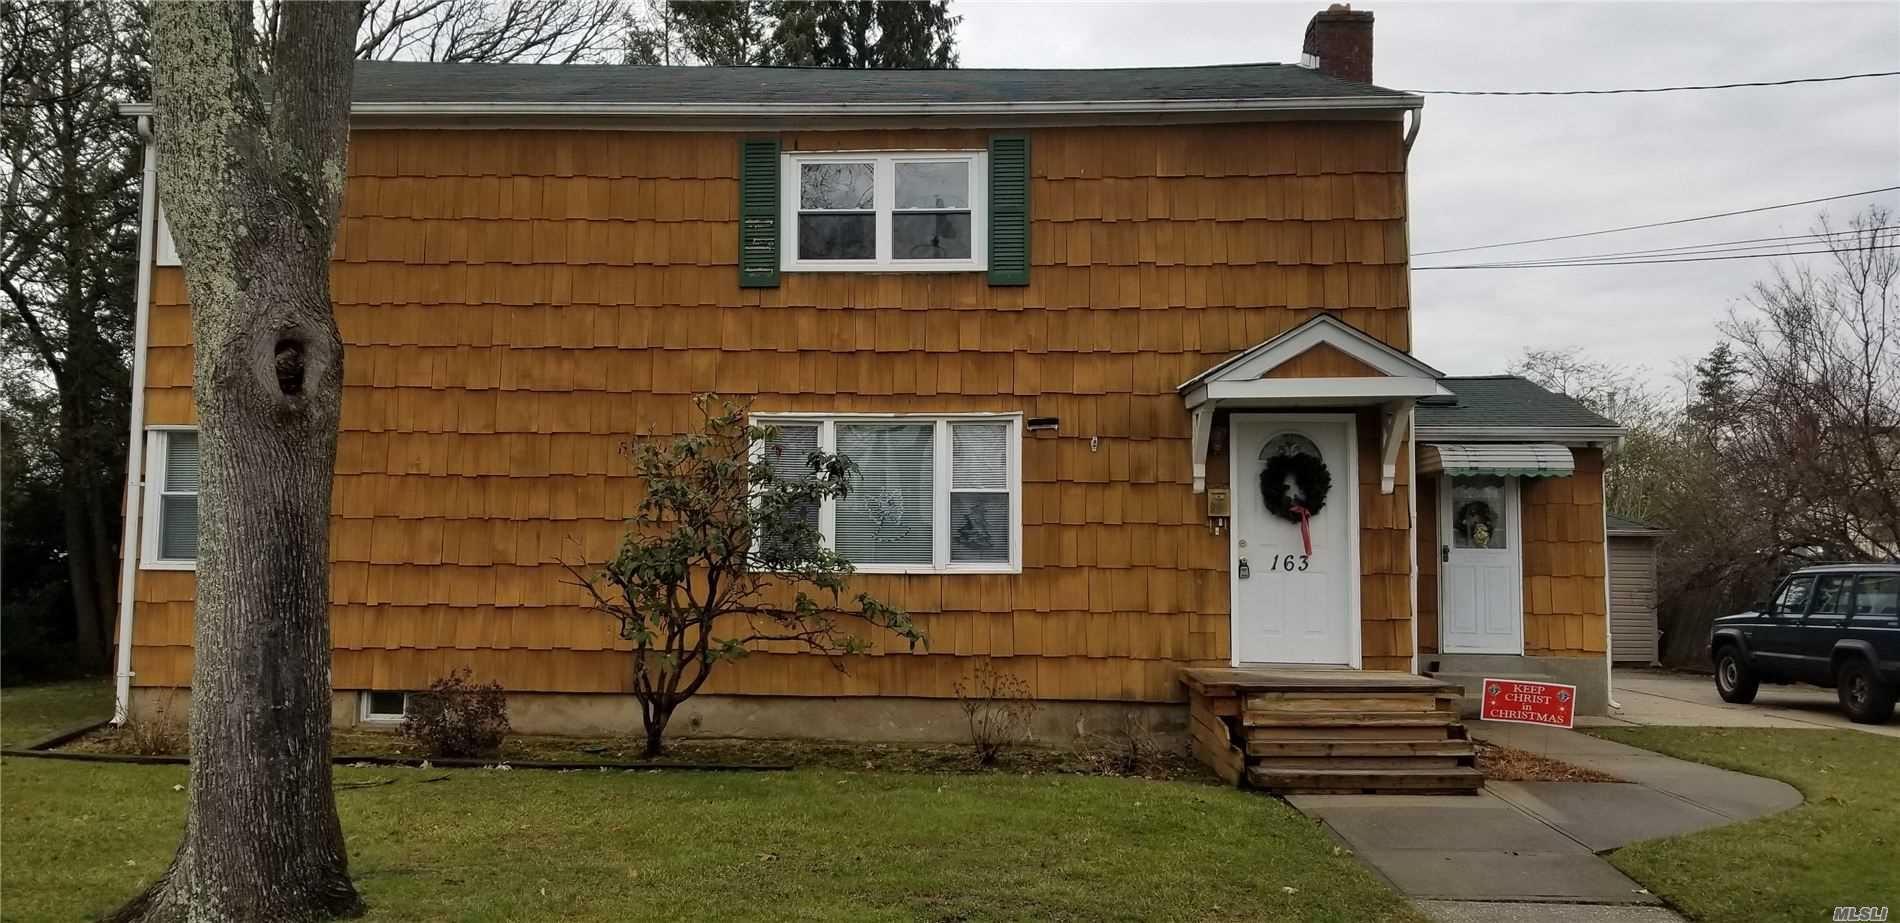 163 New Hampshire Avenue, Massapequa, NY 11758 - MLS#: 3226490